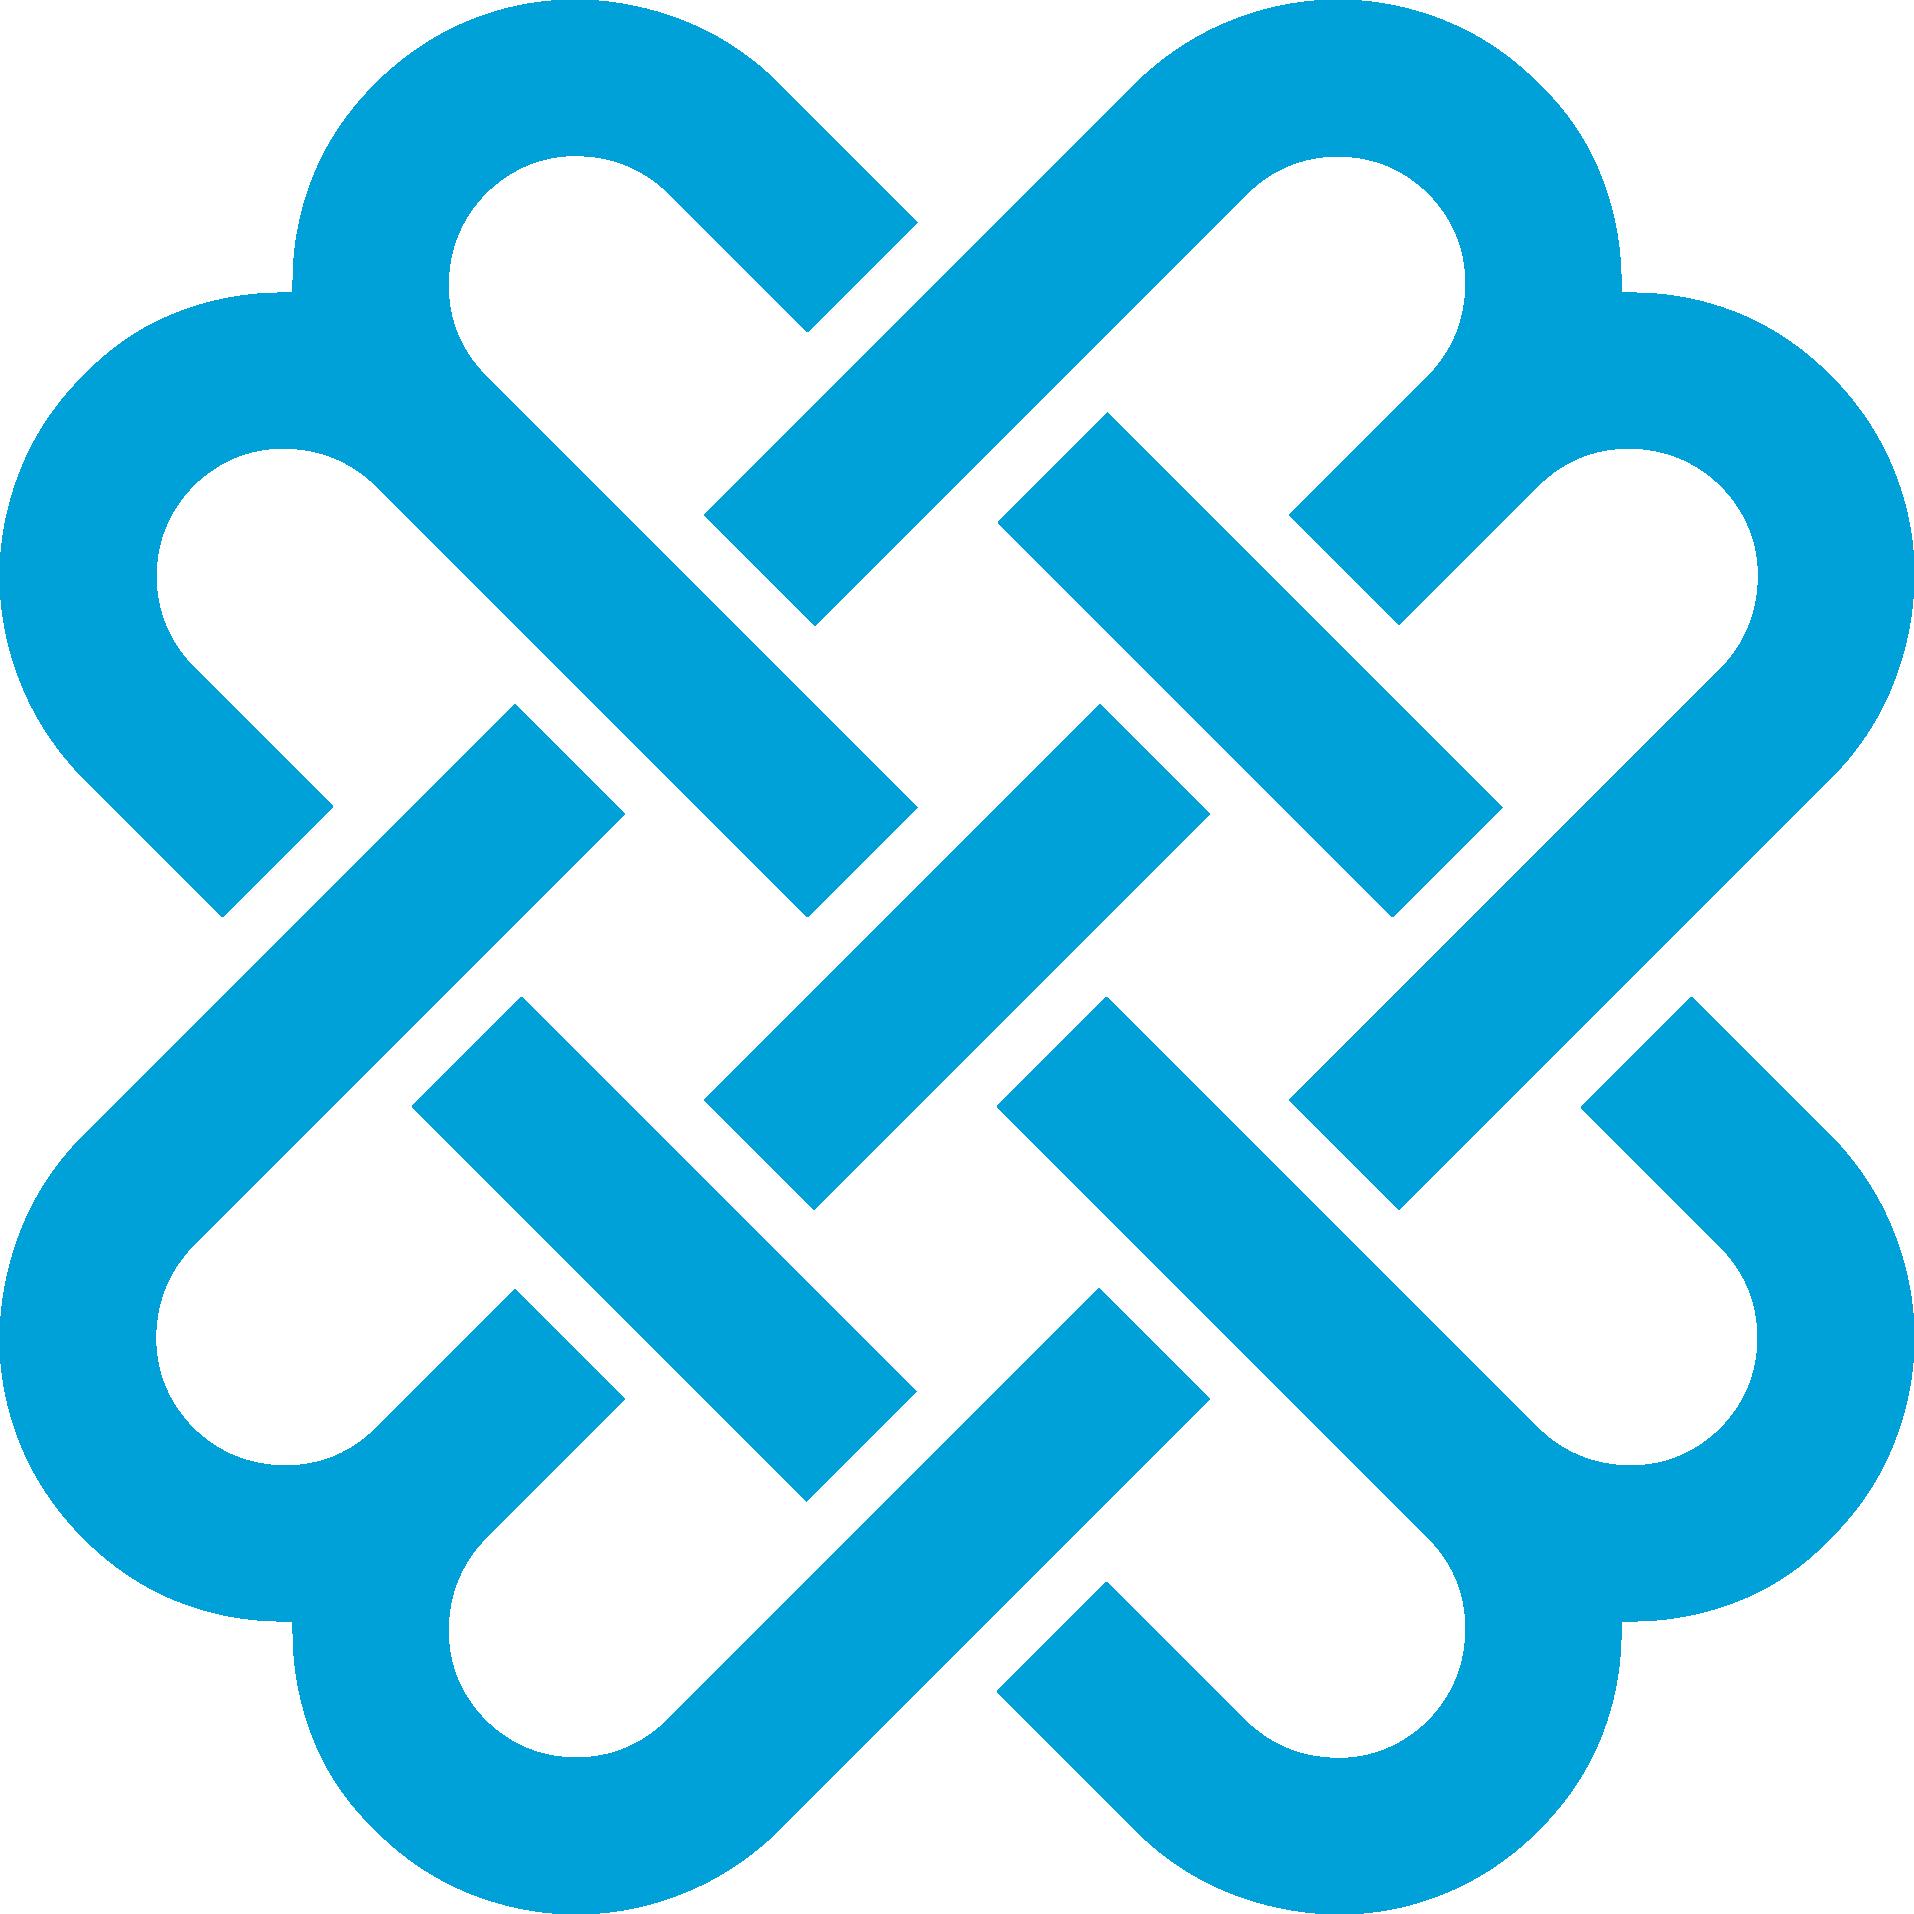 Simbolo azul